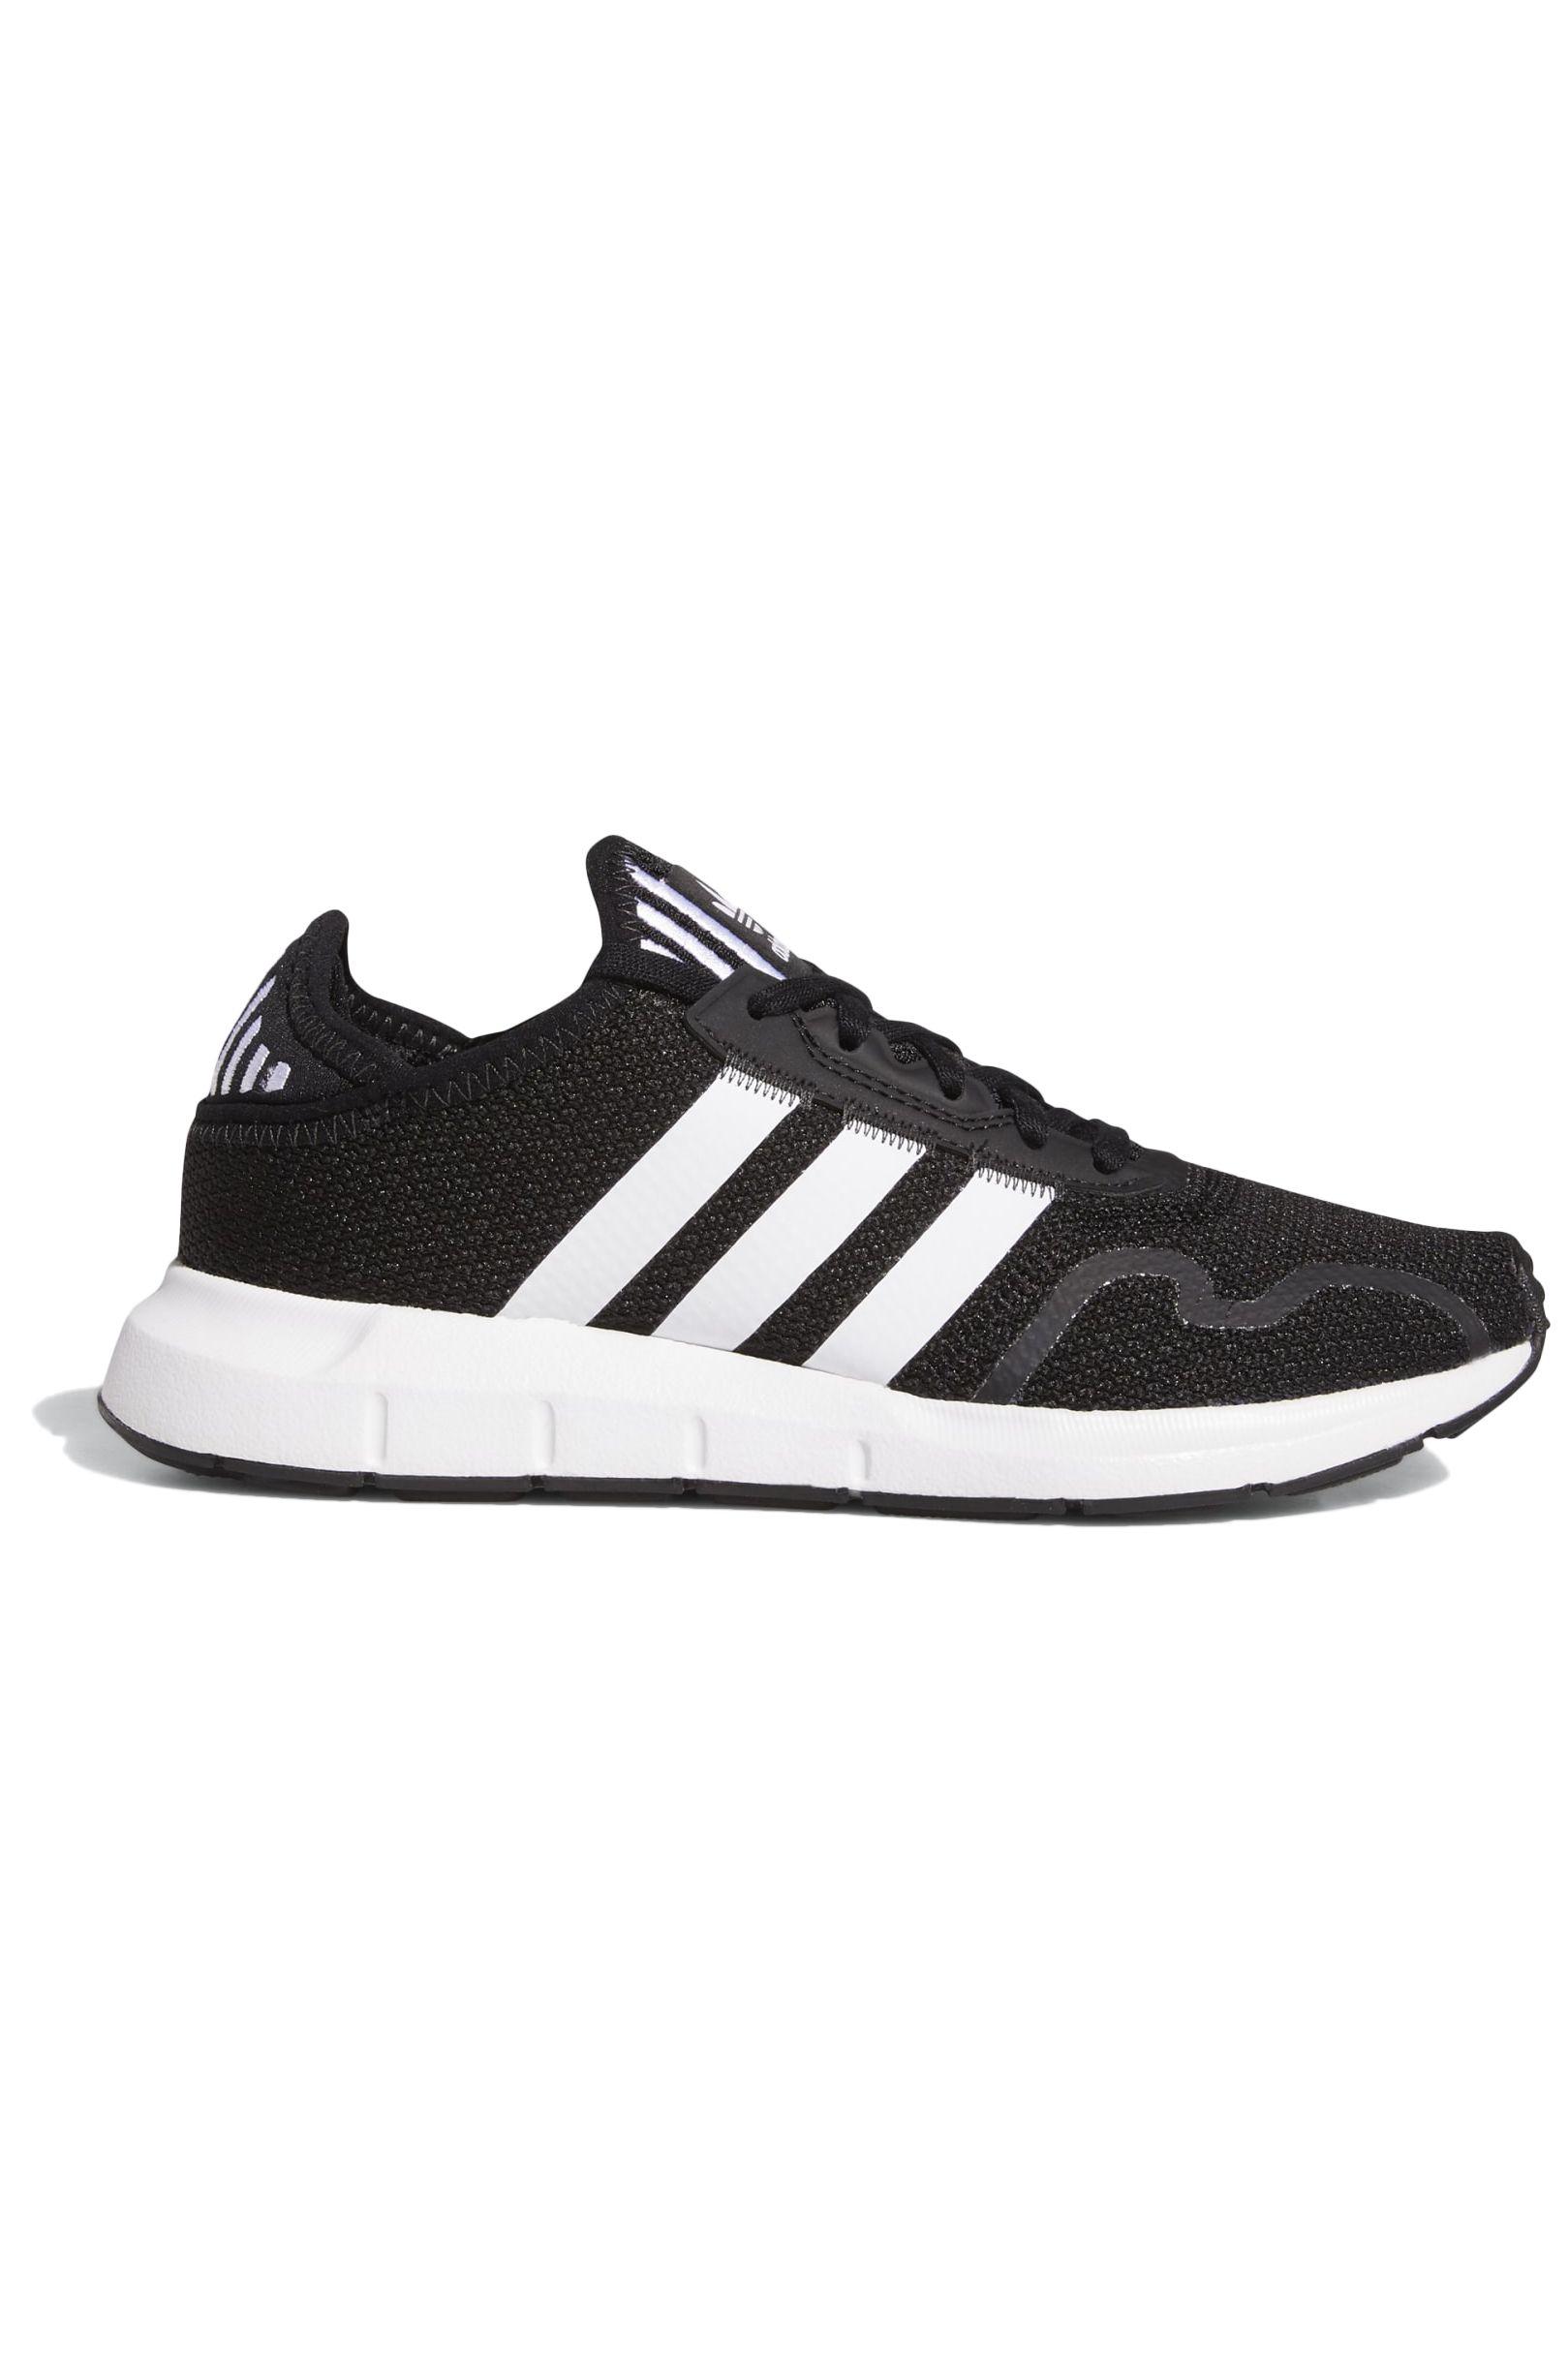 Tenis Adidas SWIFT RUN X J Coreblack